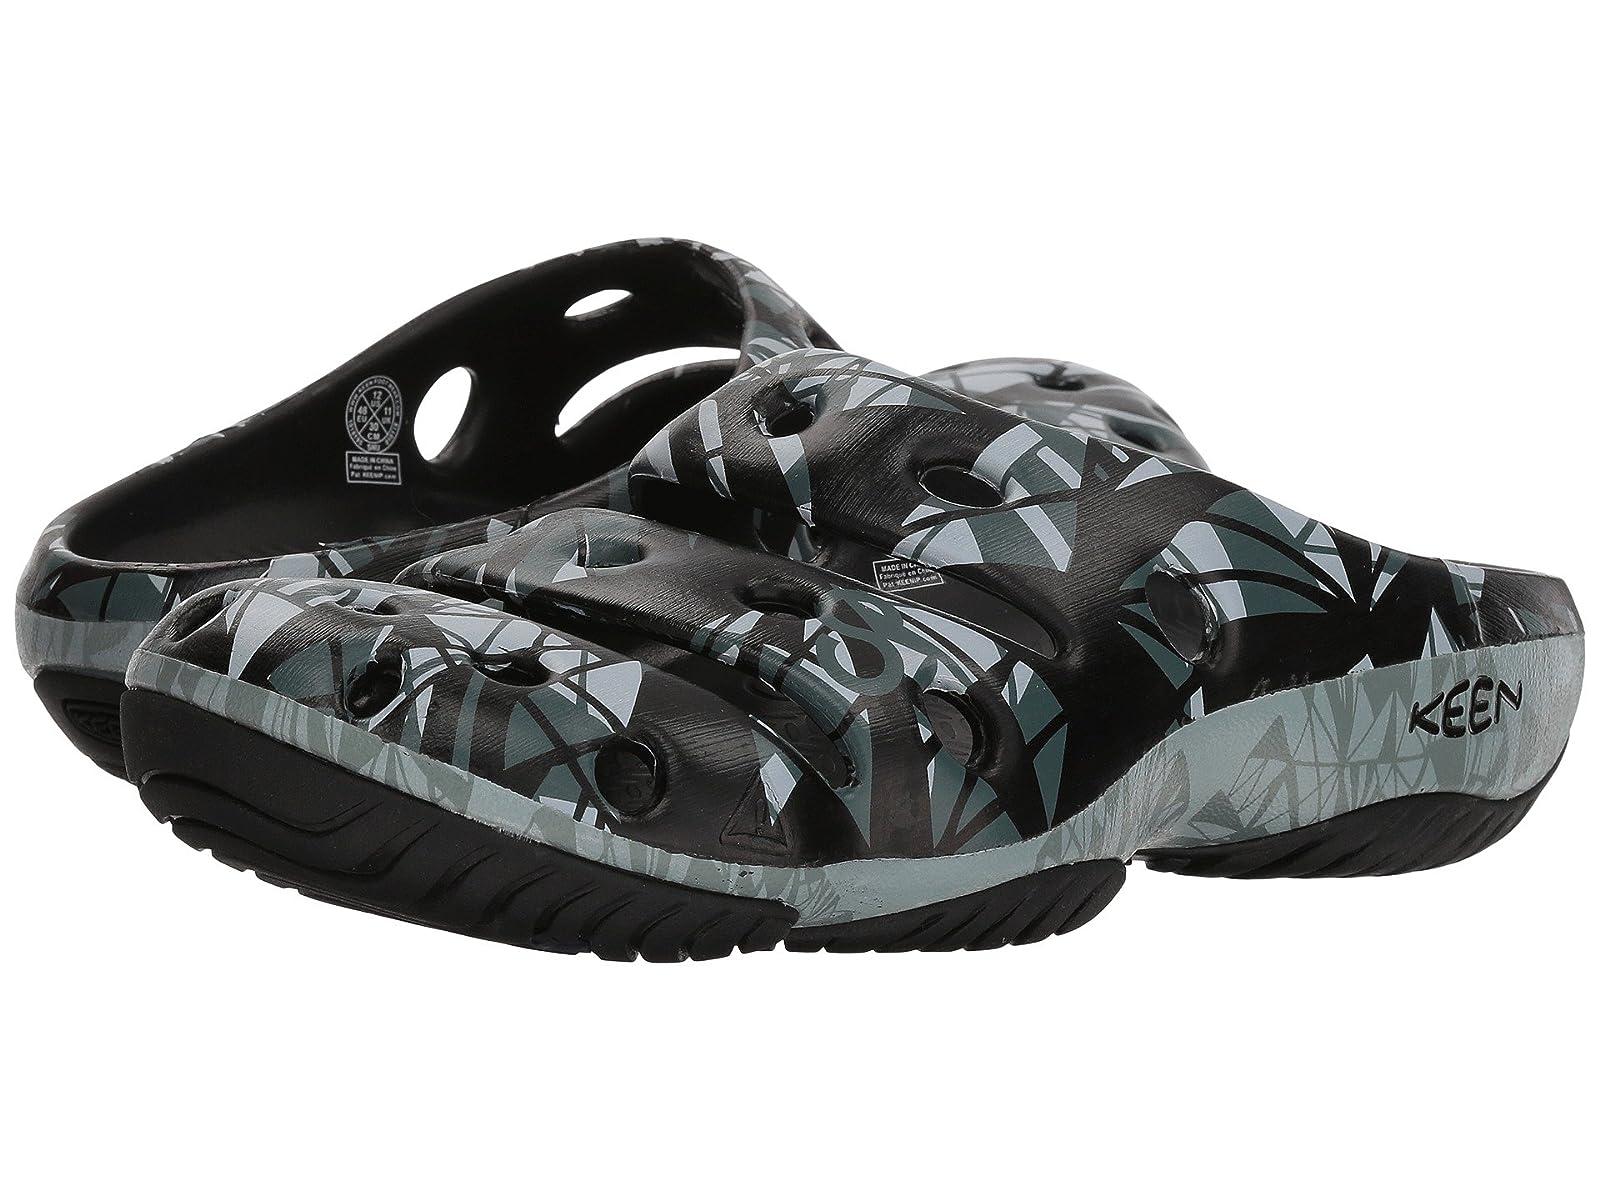 Keen Yogui ArtsfullCheap and distinctive eye-catching shoes